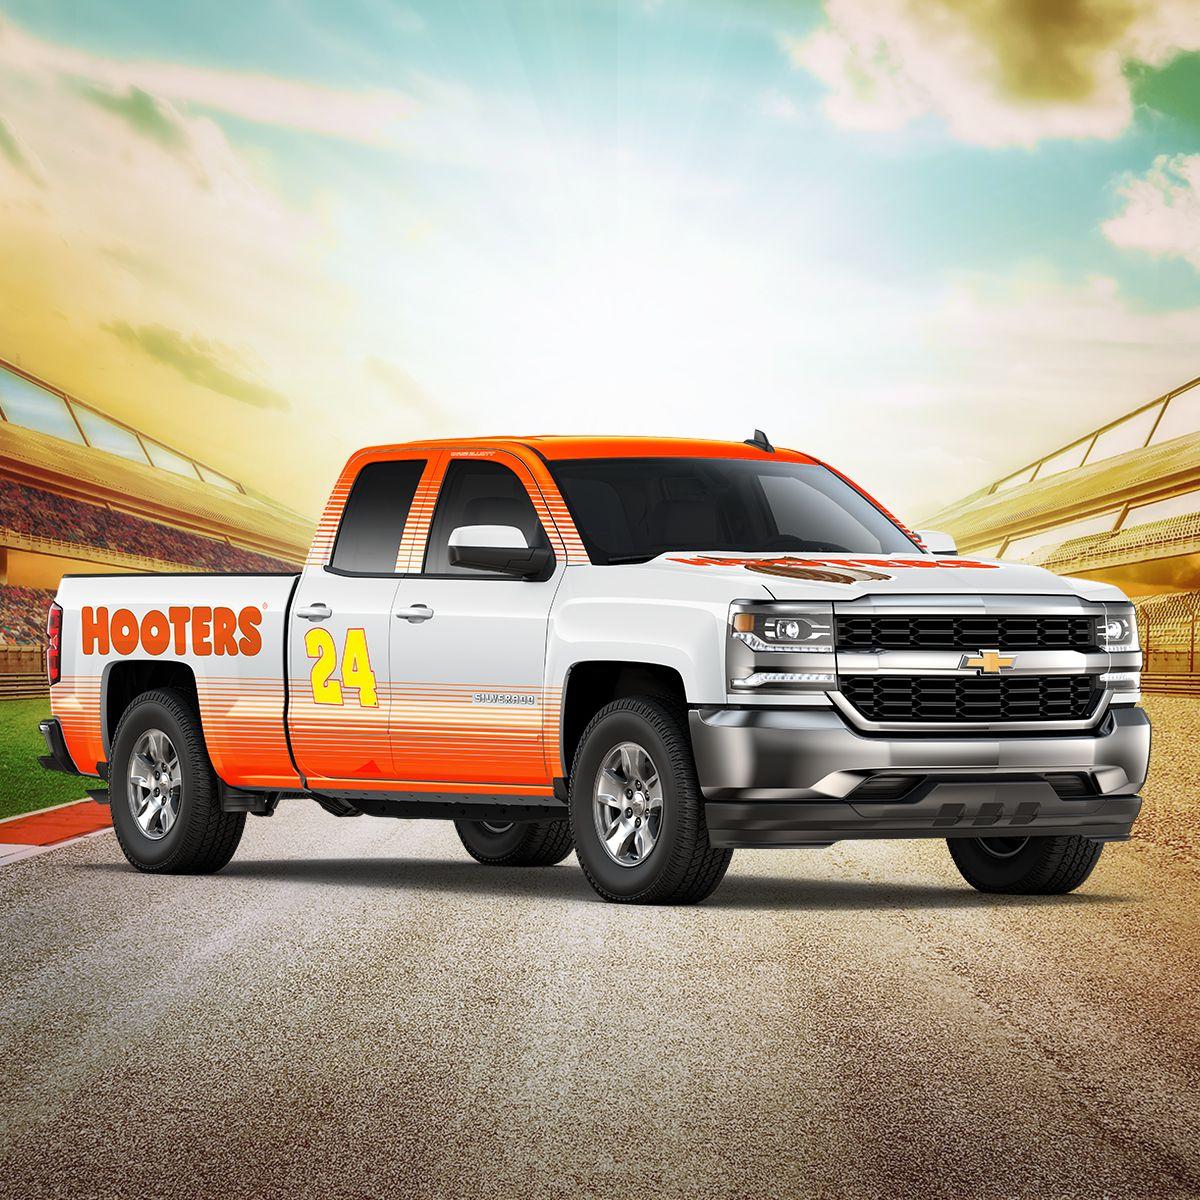 Hooters Returns to Track as Chase Elliott's Primary Sponsor for November Races